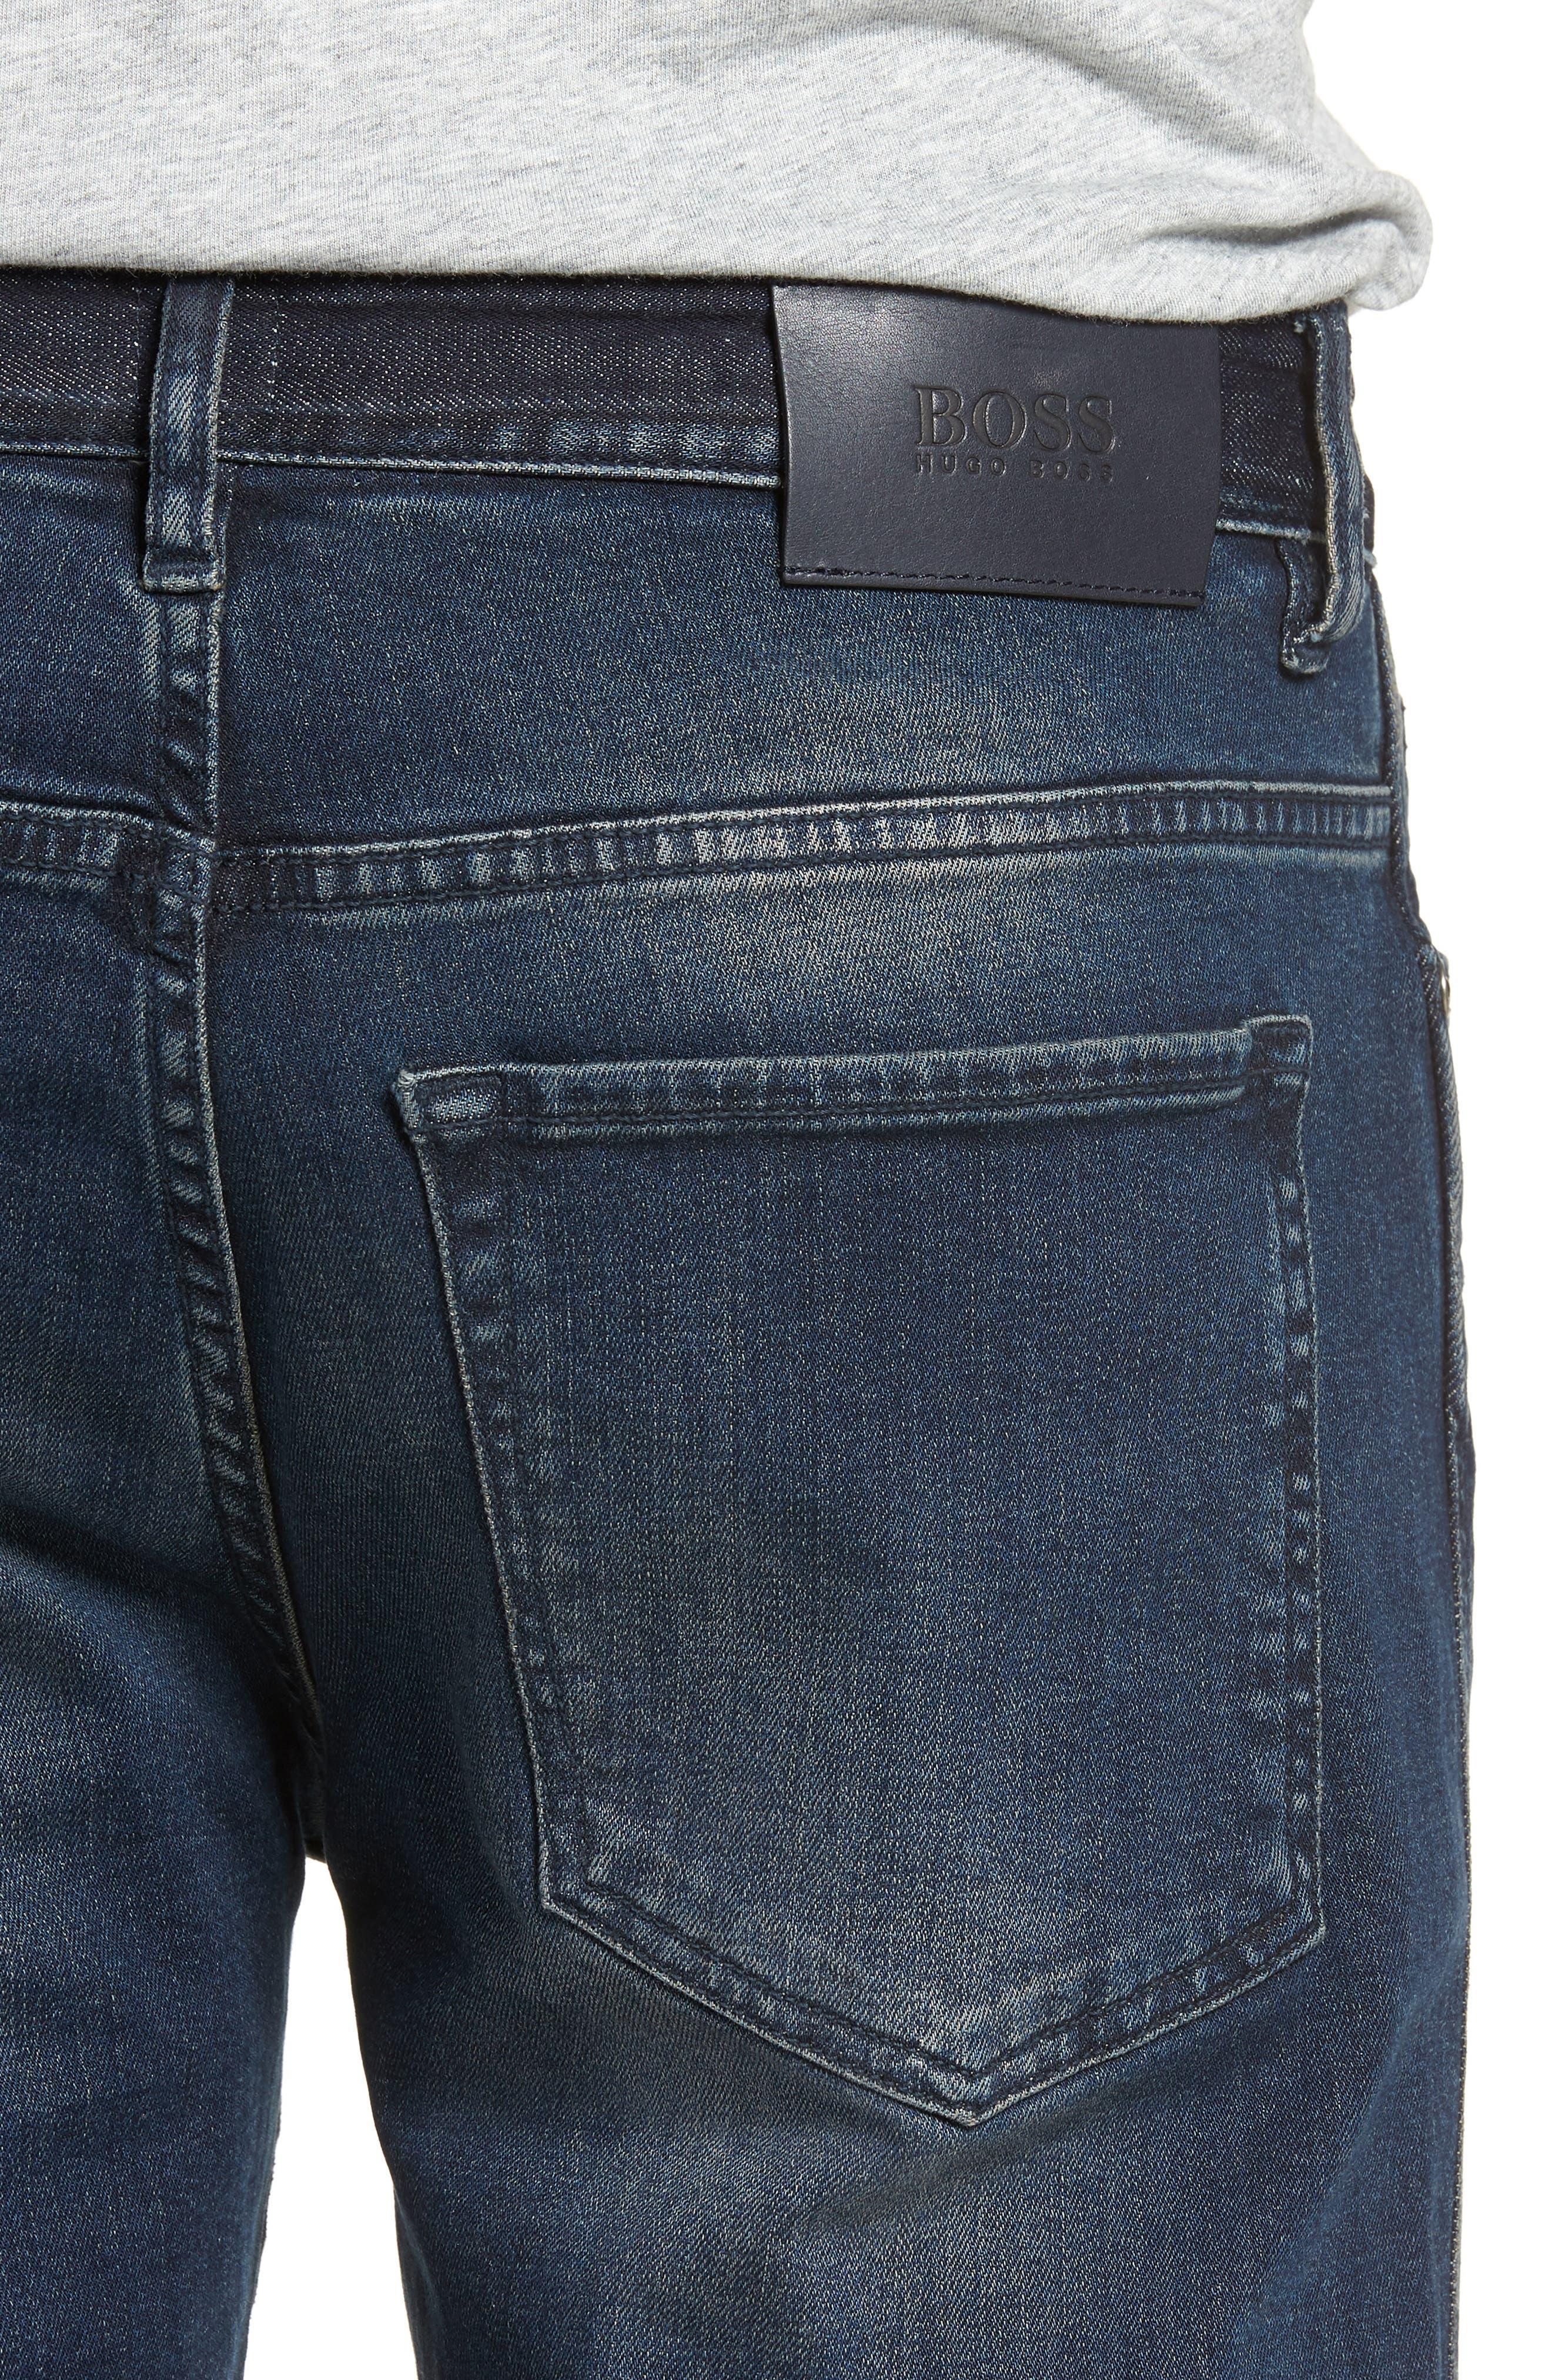 Delaware Slim Fit Jeans,                             Alternate thumbnail 4, color,                             418